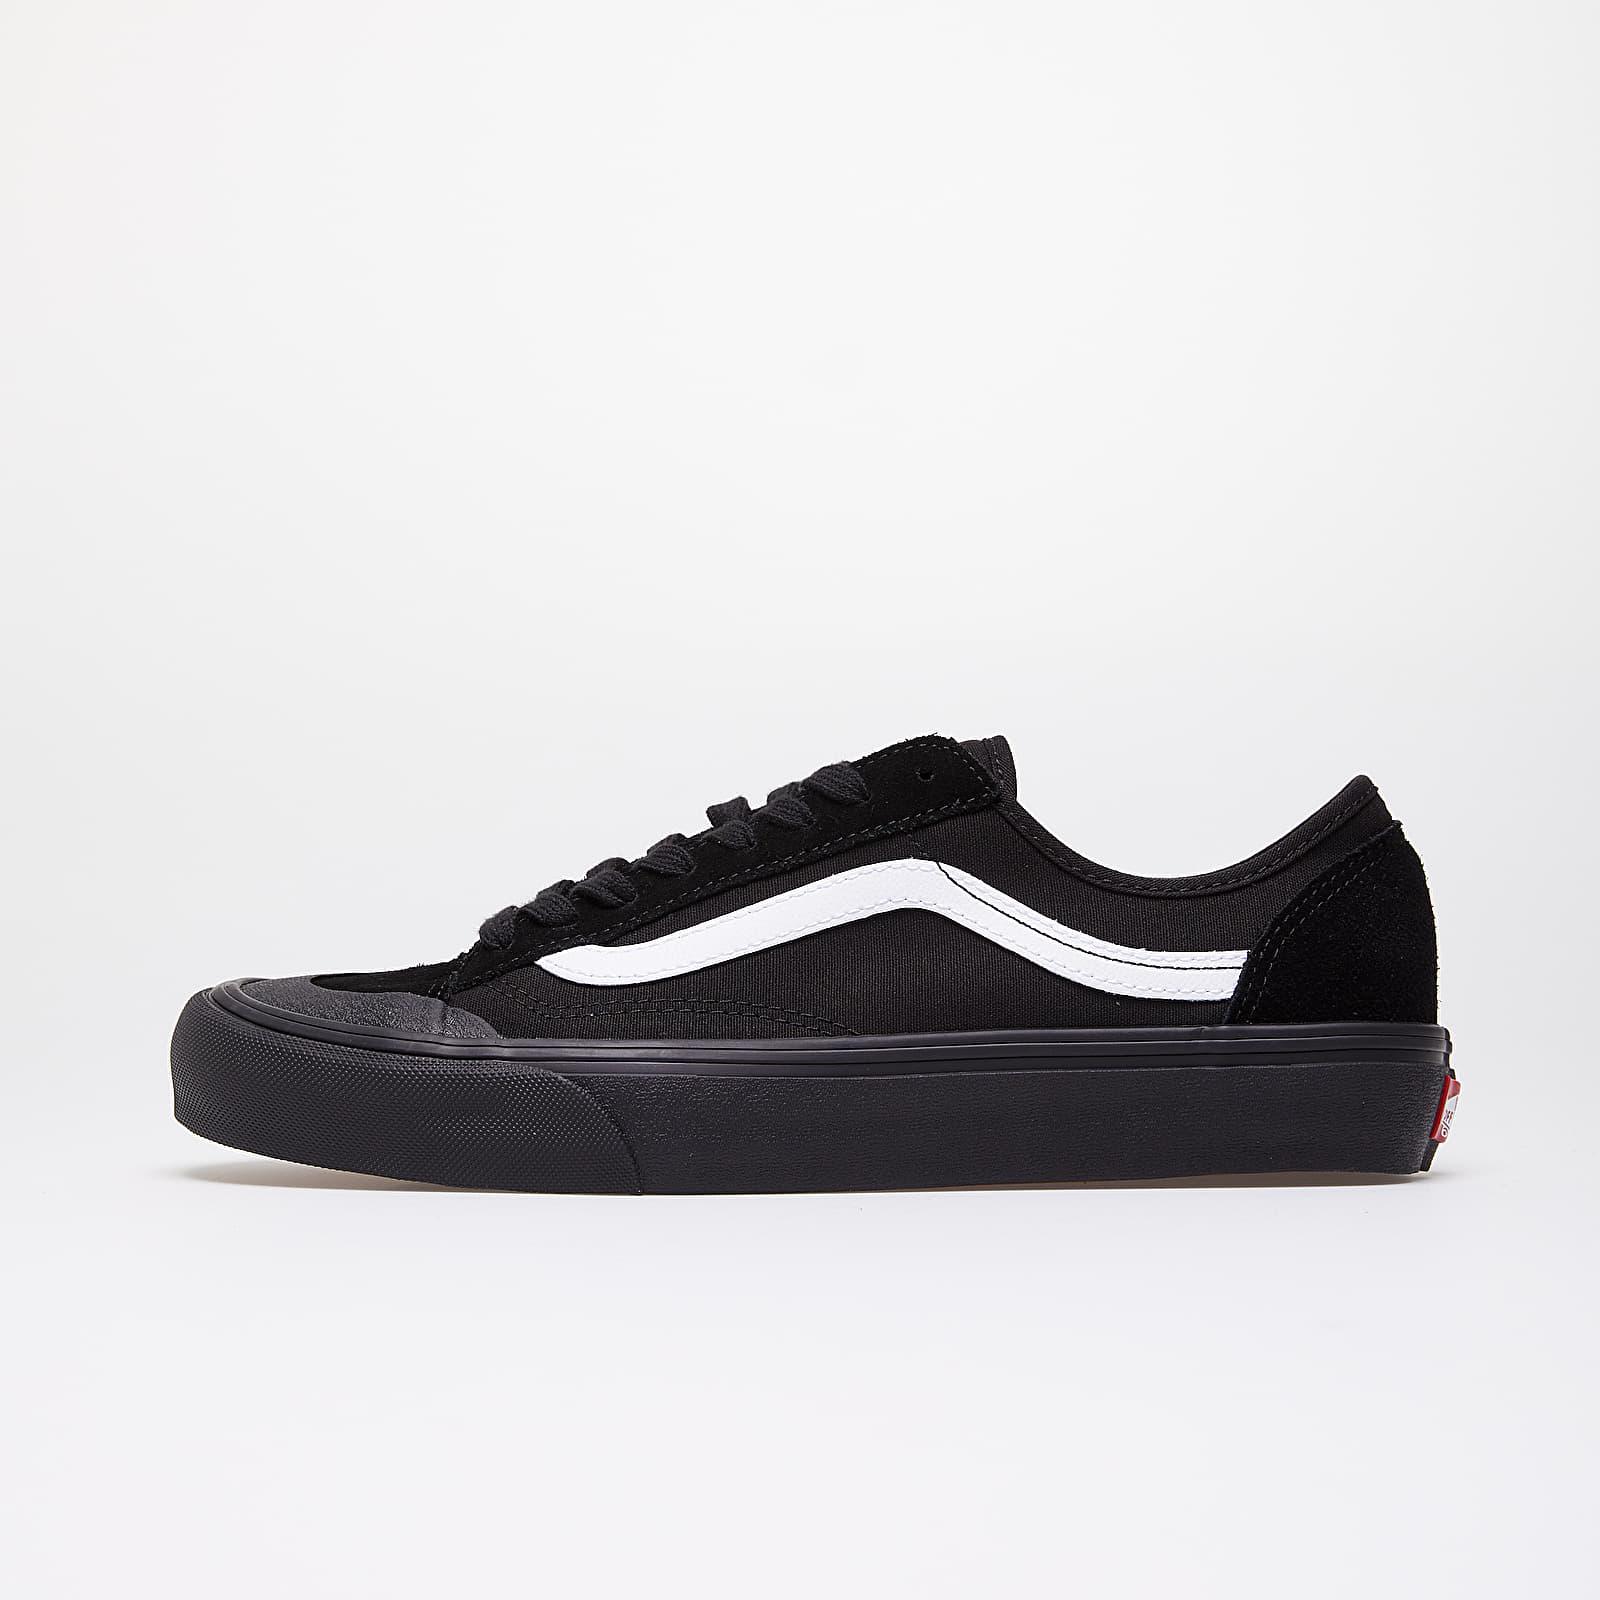 Pánské tenisky a boty Vans Style 36 Decon Sf Black/ Black/ White